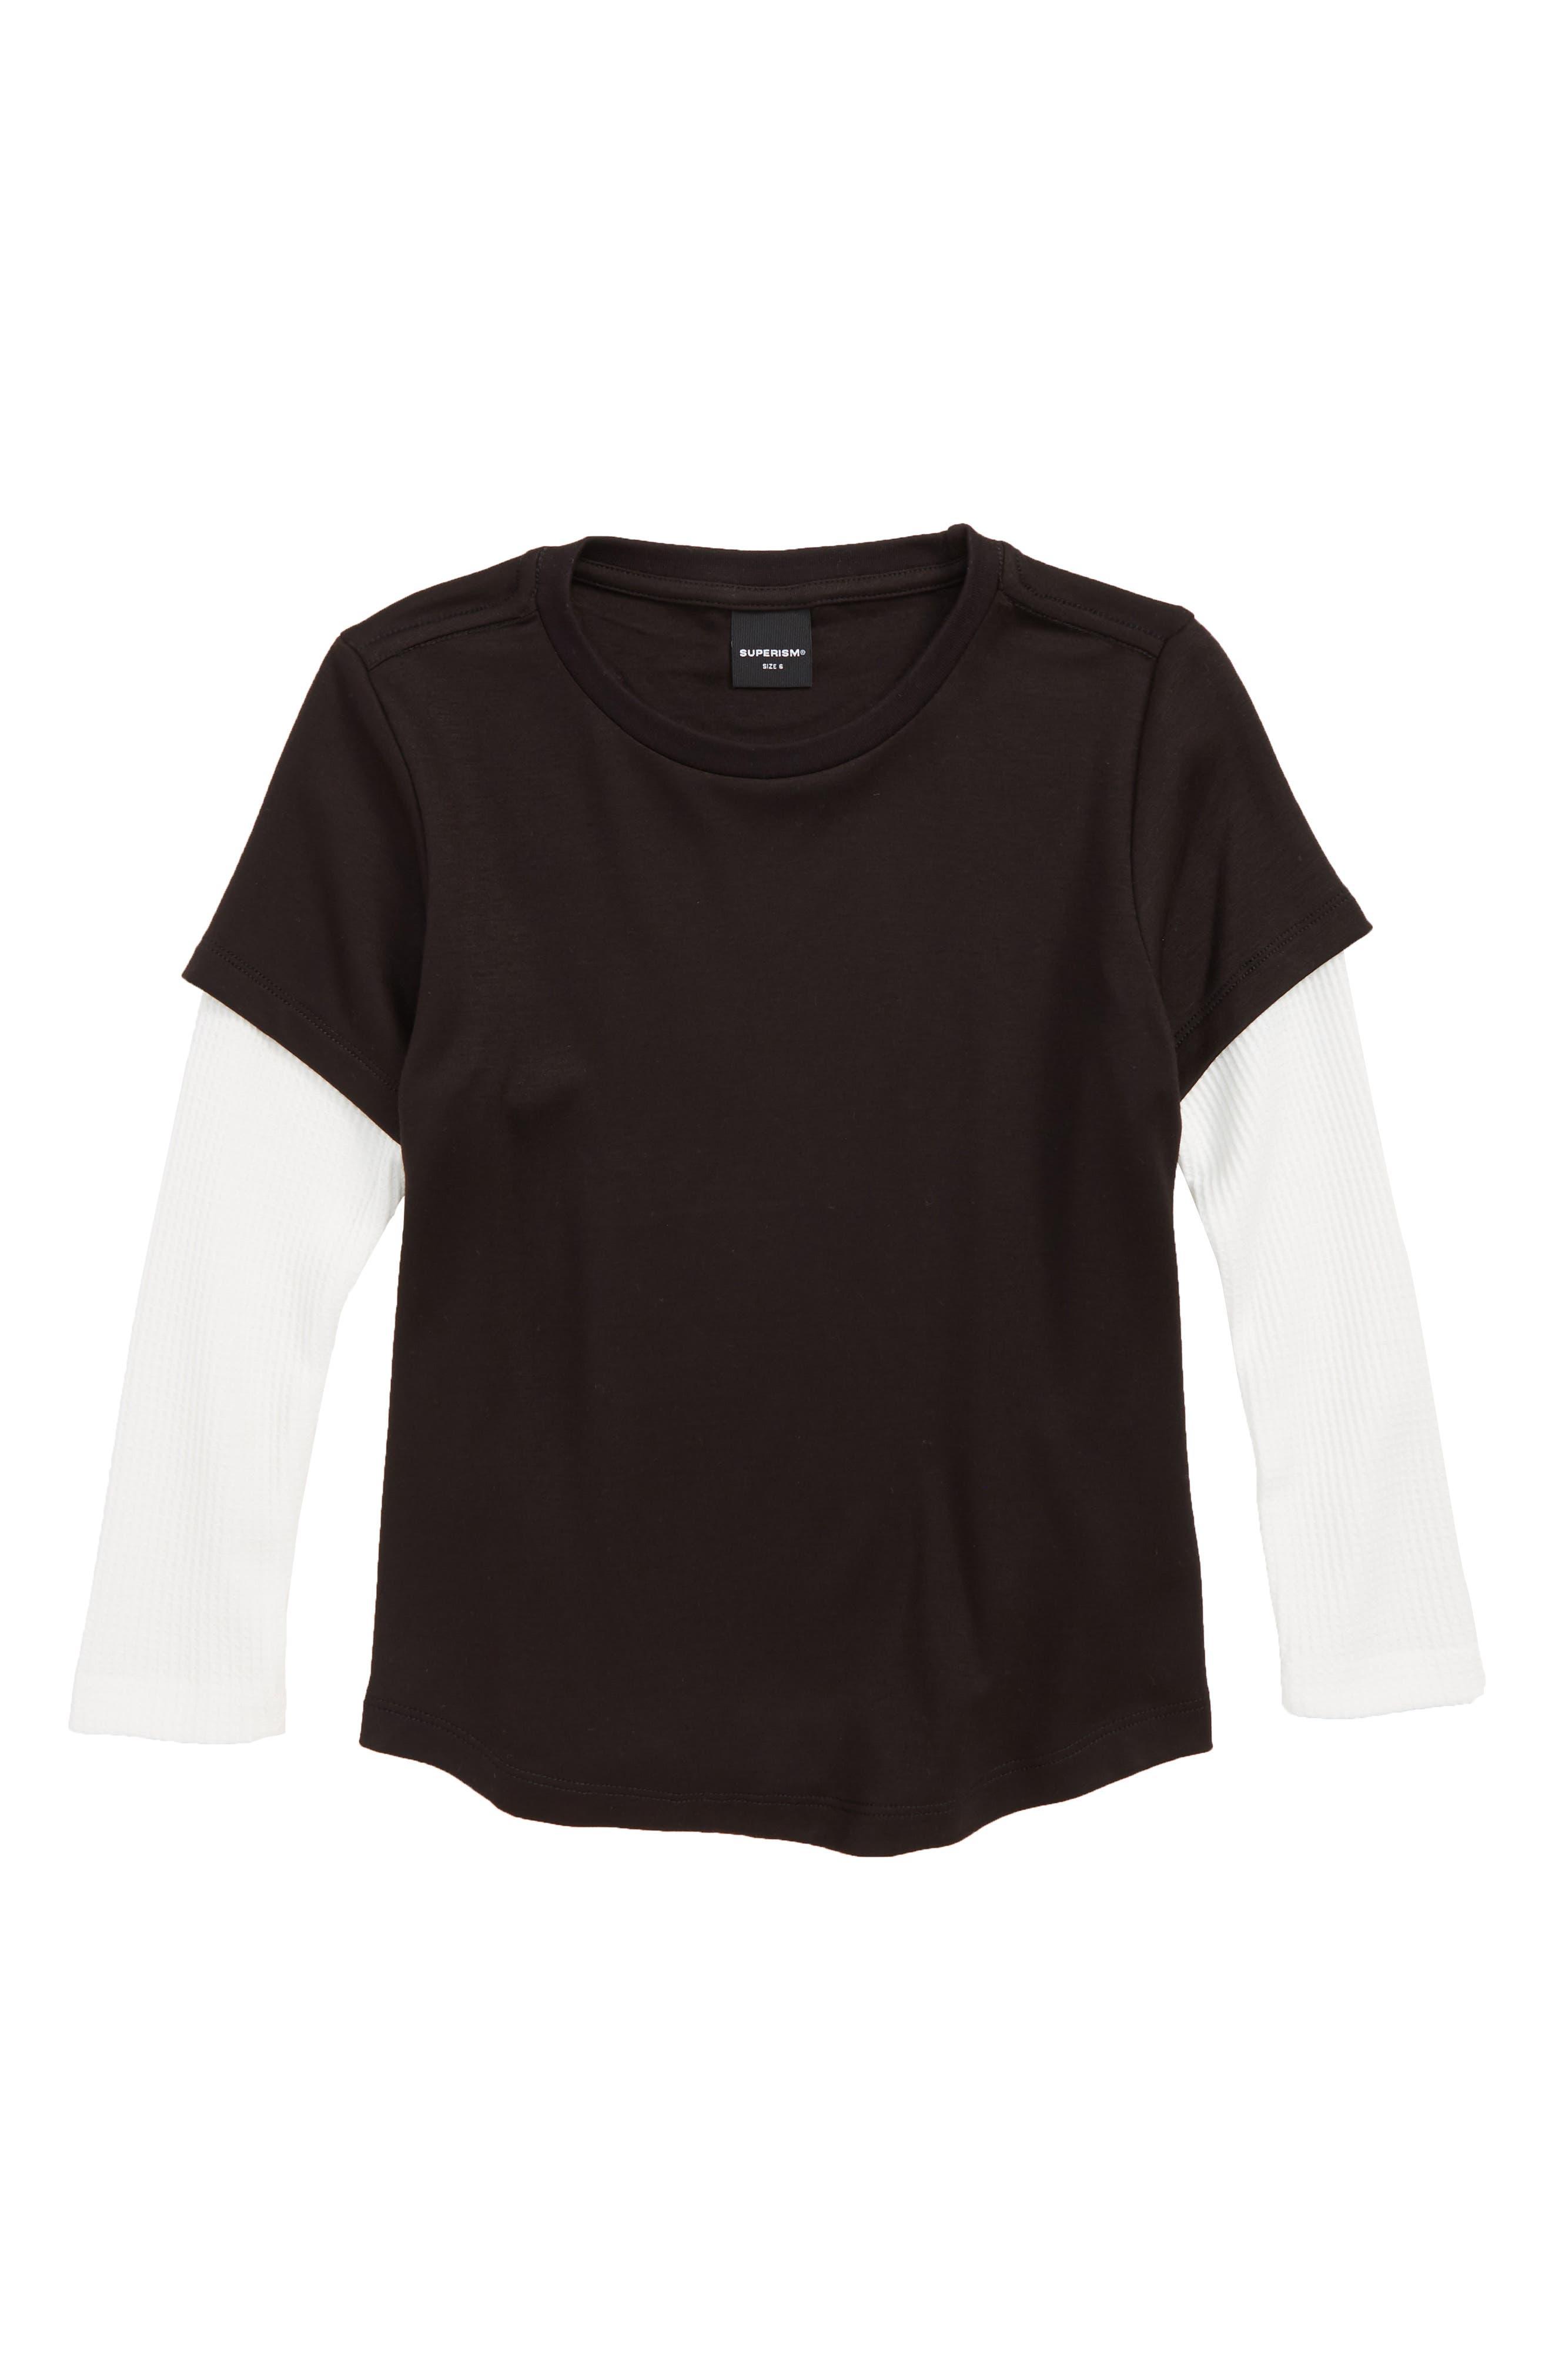 James T-Shirt,                             Main thumbnail 1, color,                             BLACK